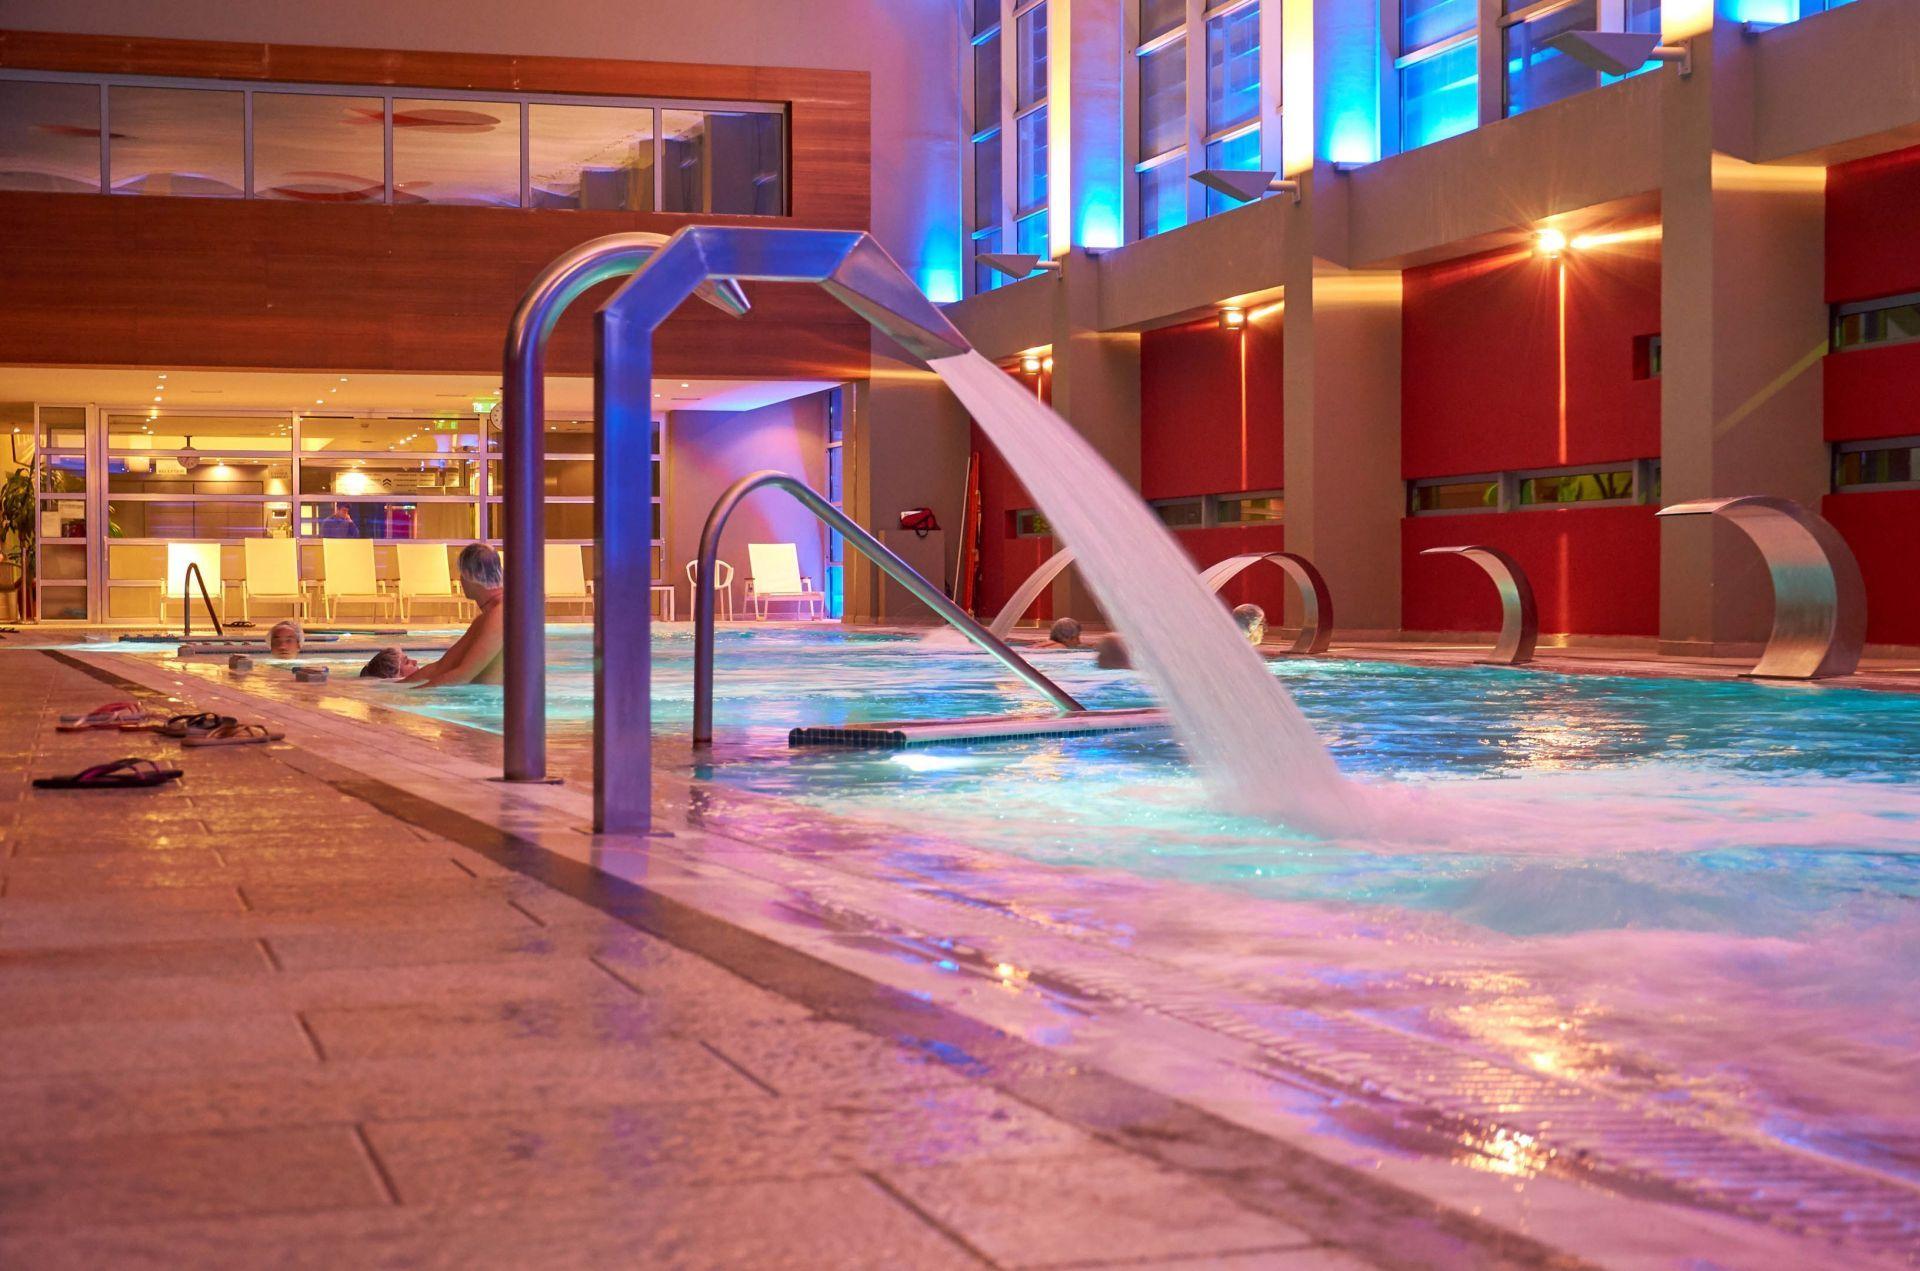 Greece wellness: Spa center